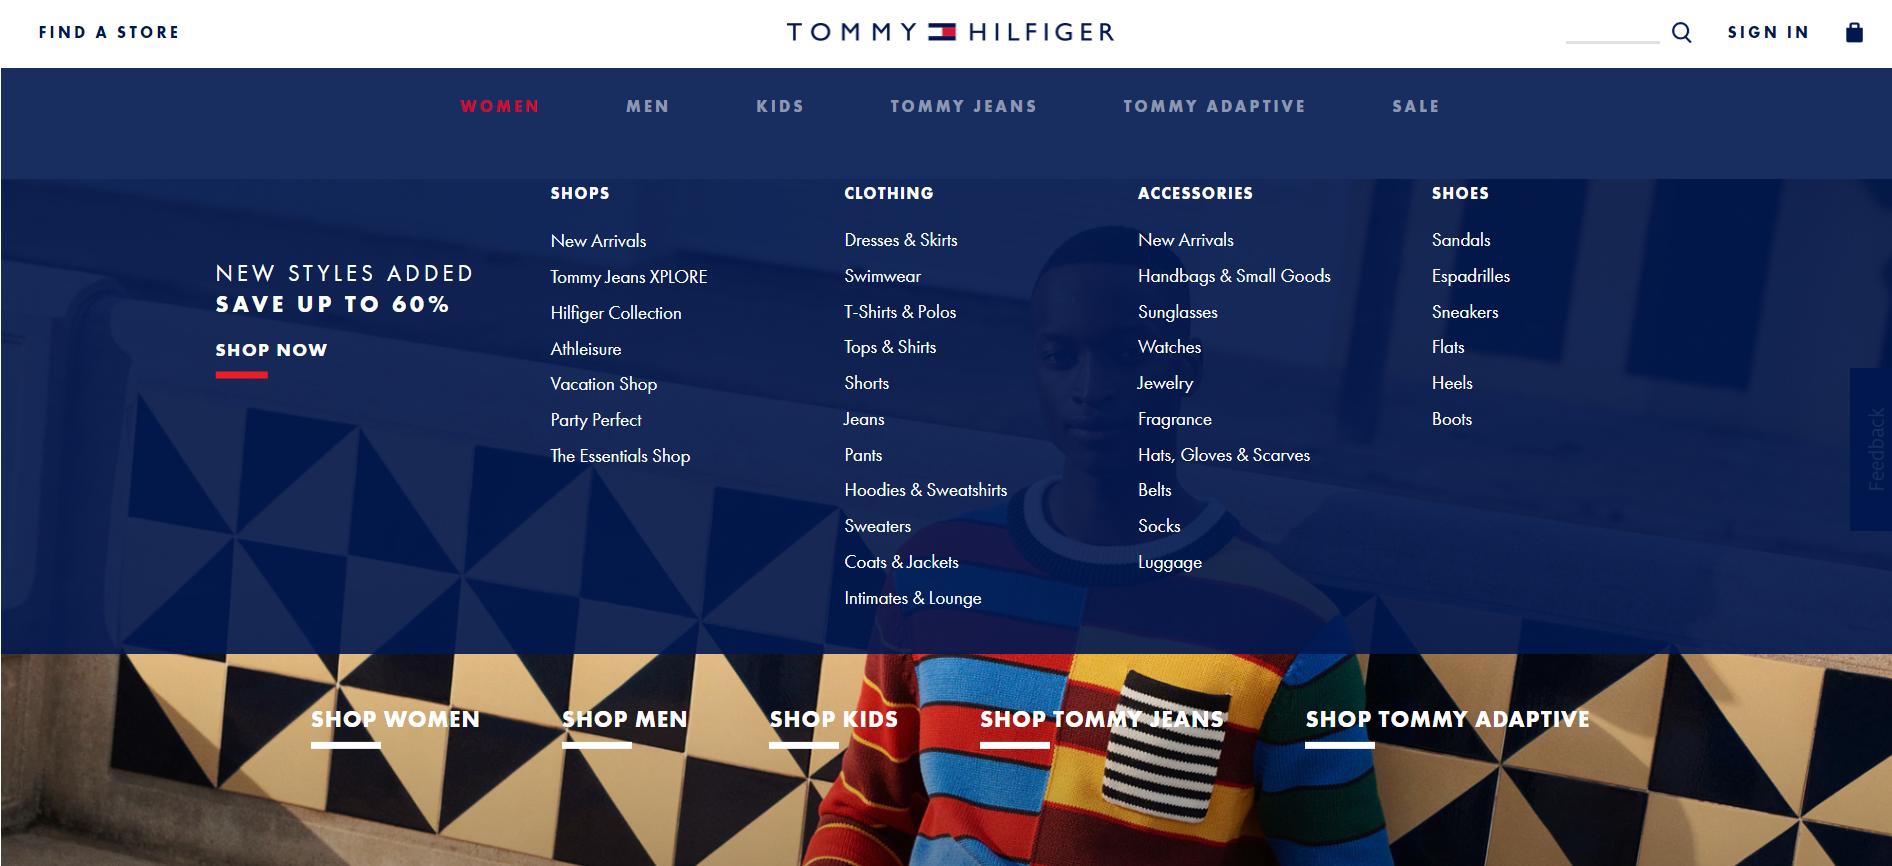 Tommy Hilfiger product categories screenshot